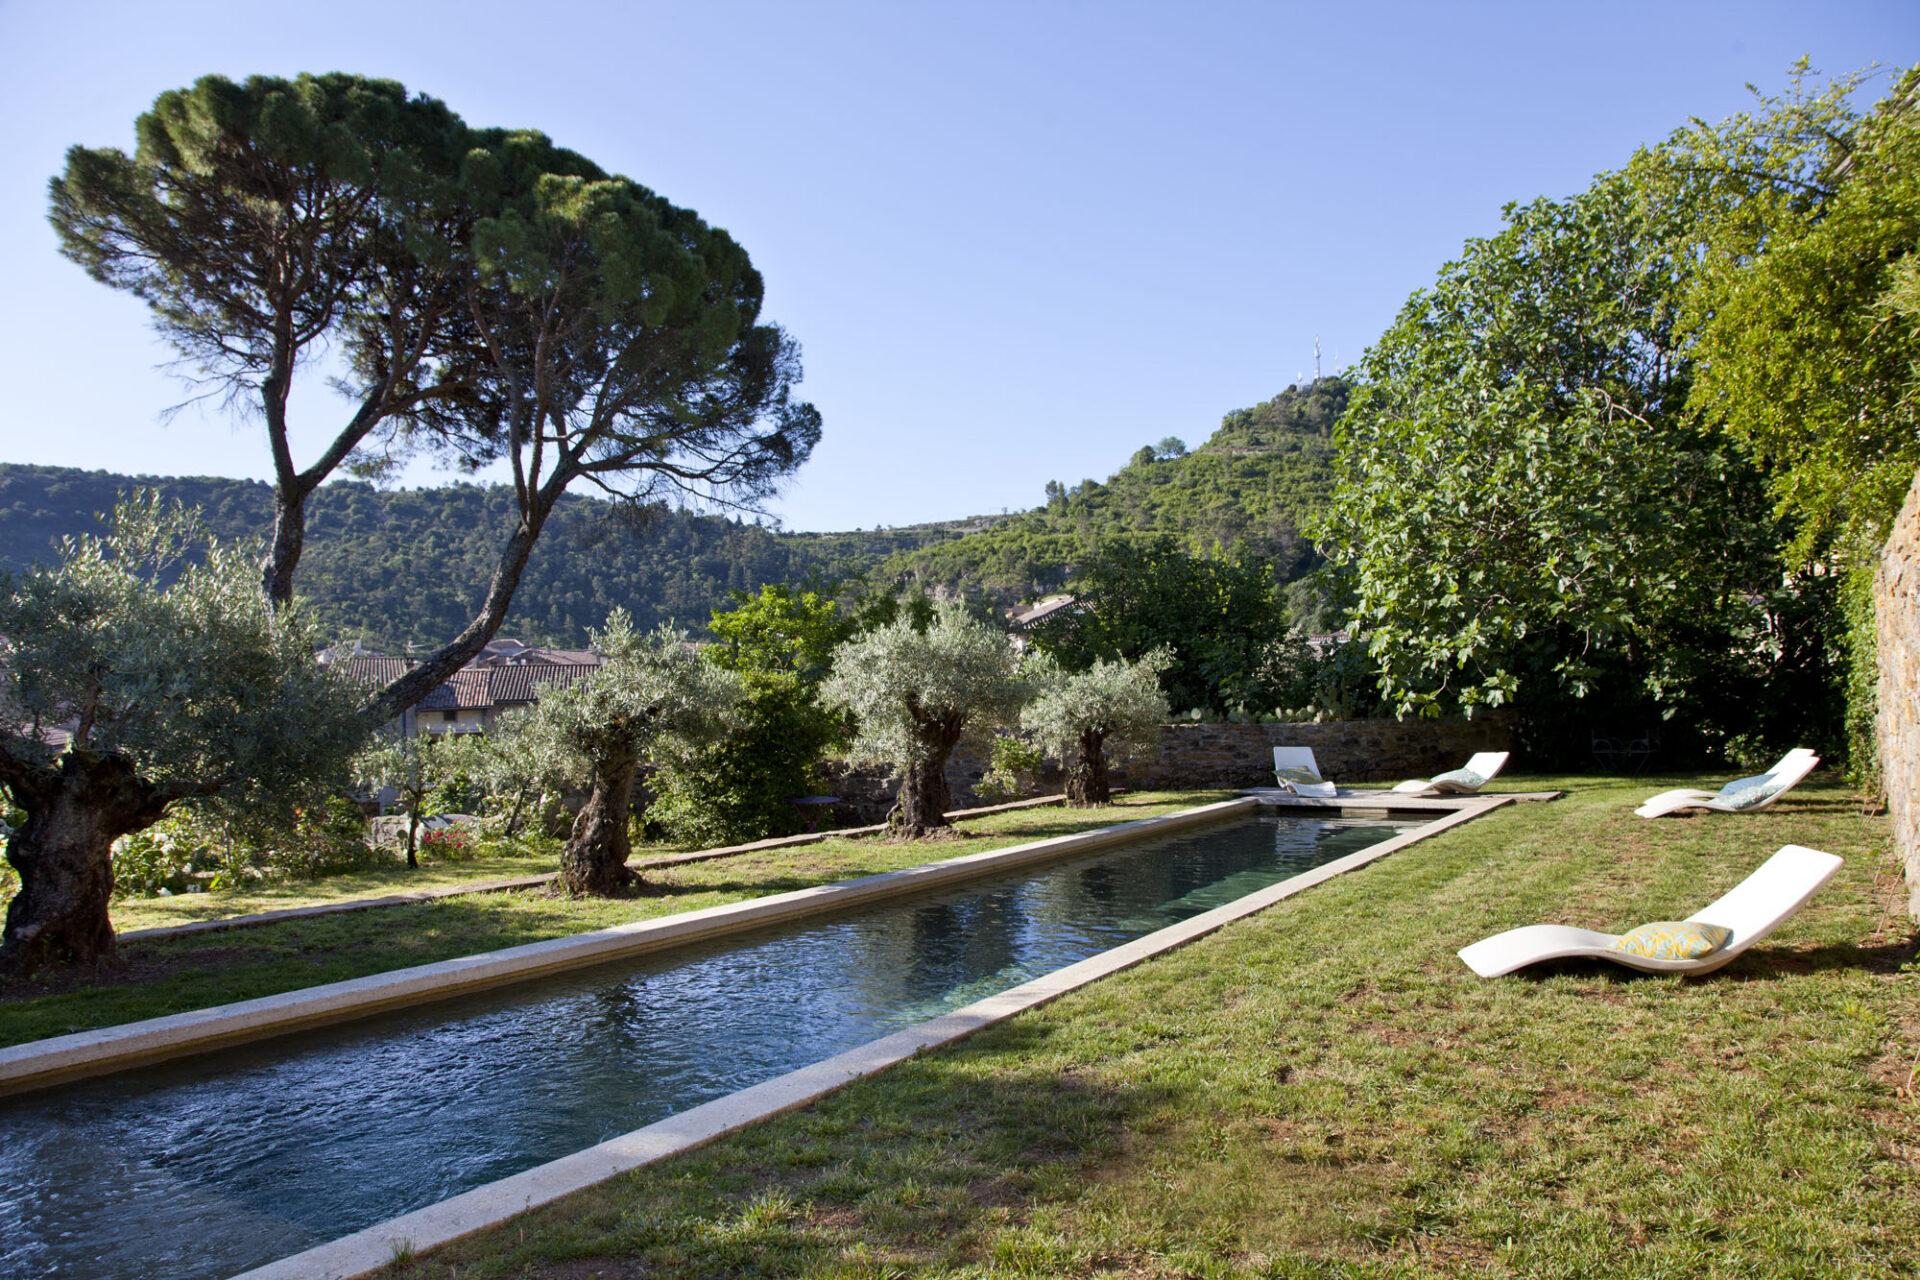 Panorama piscine, maison Le 35 Mai en Ardèche. © Elodie Rothan